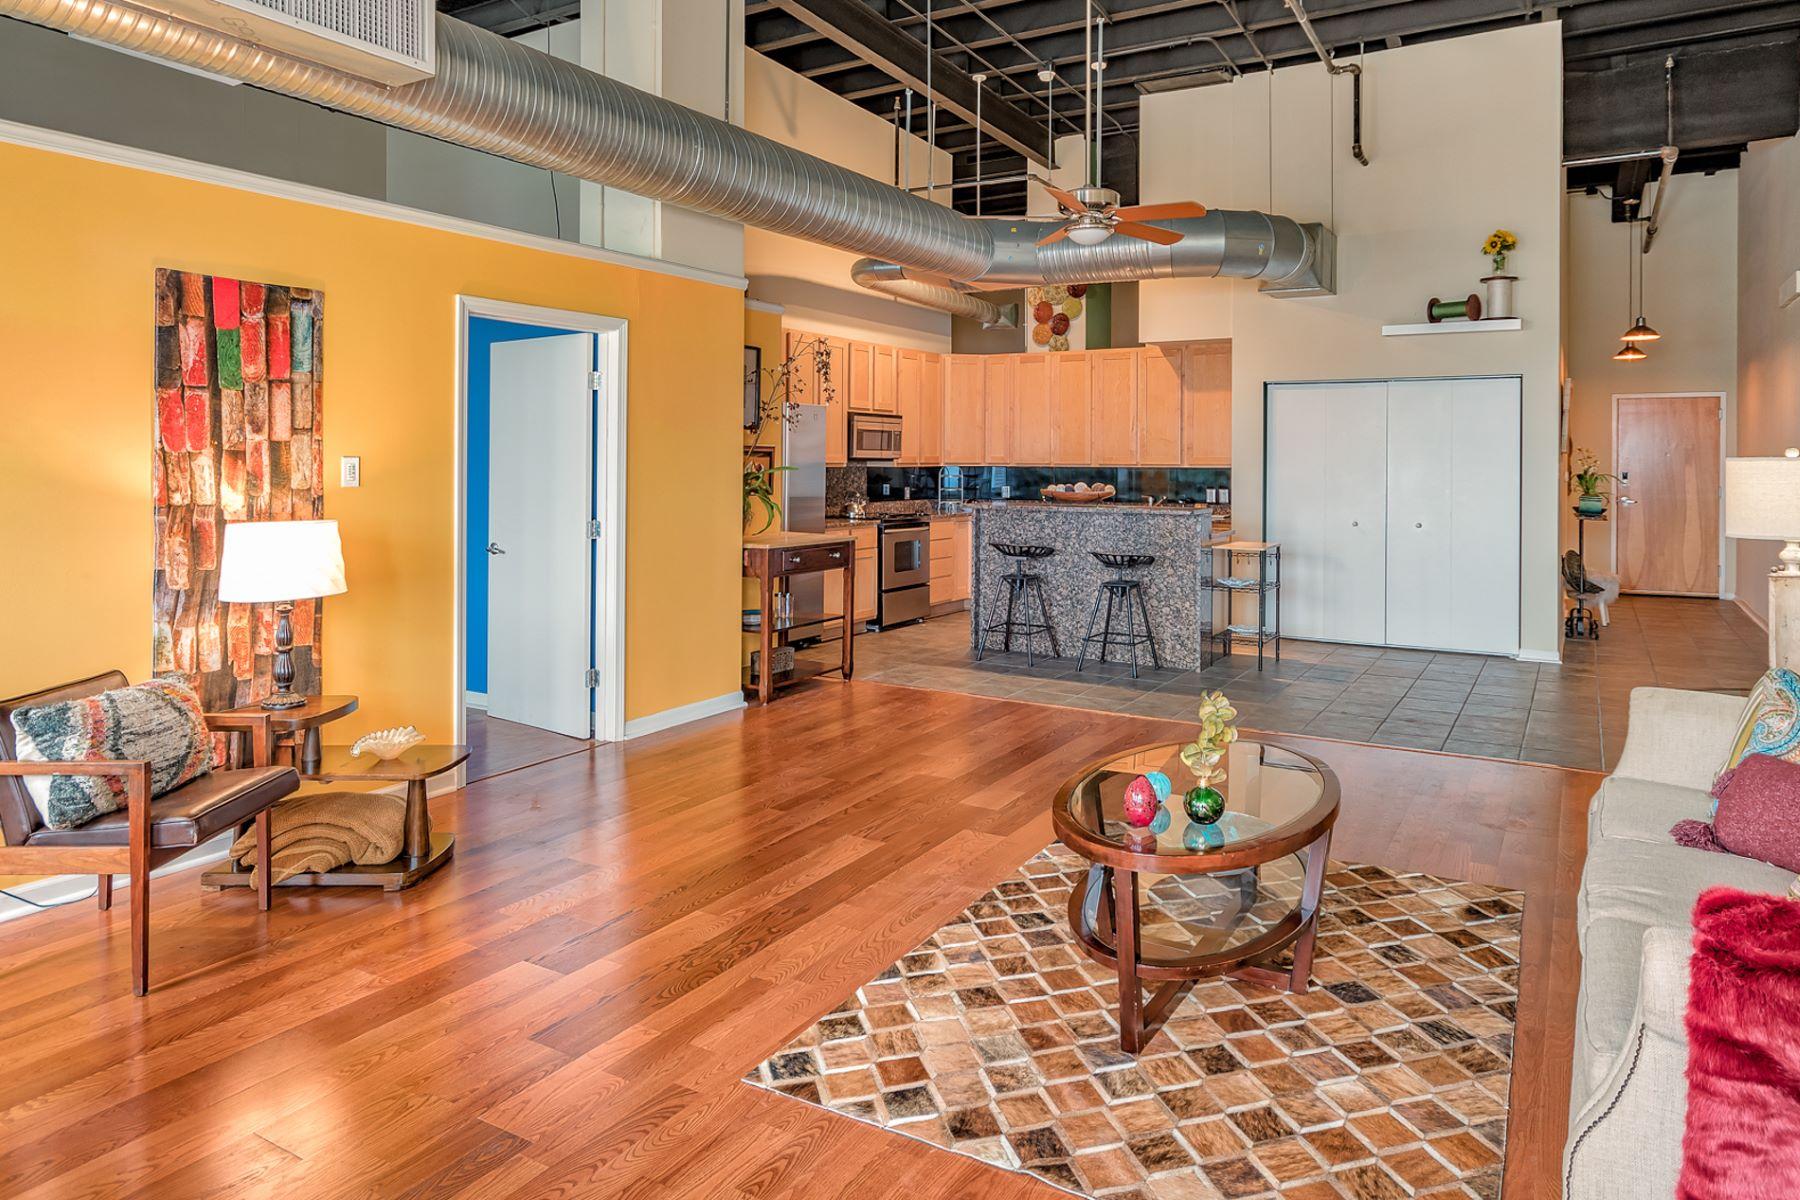 Additional photo for property listing at Locust Street 1501 Locust Street # 1208 St. Louis, Missouri 63131 United States